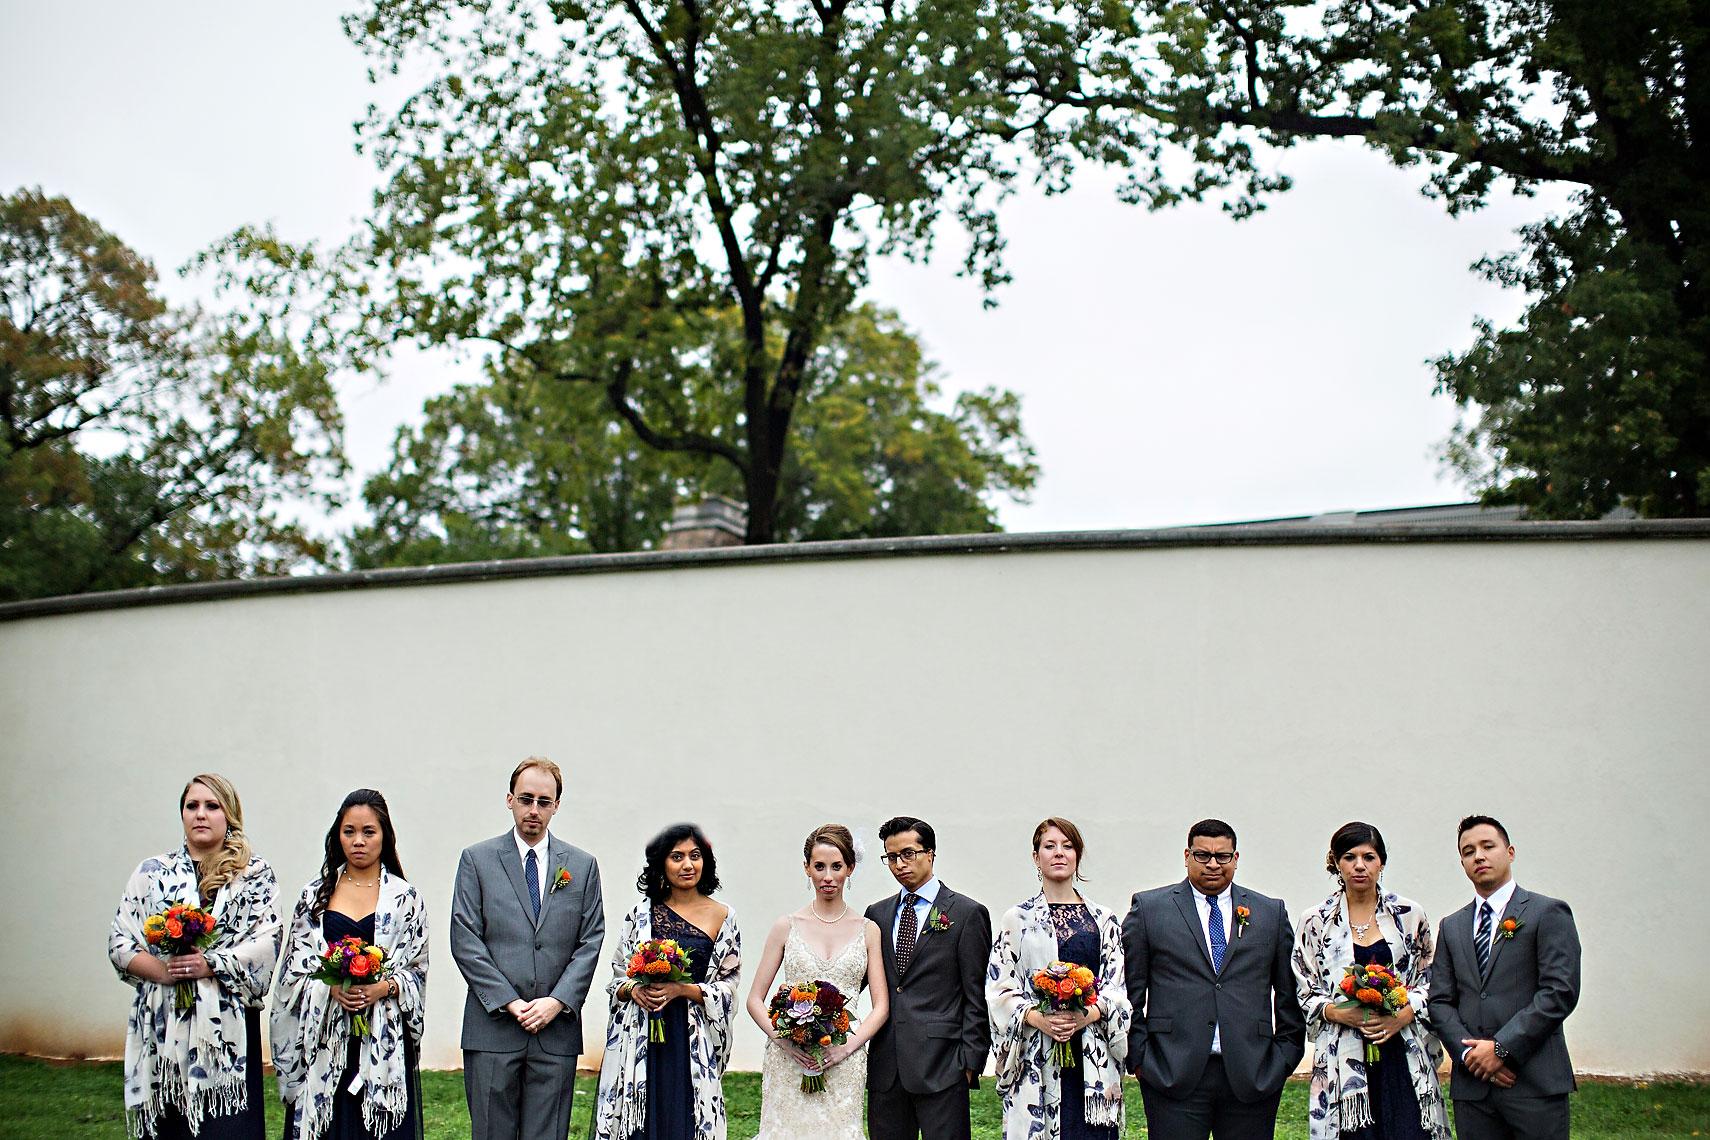 rylandinnwedding-018